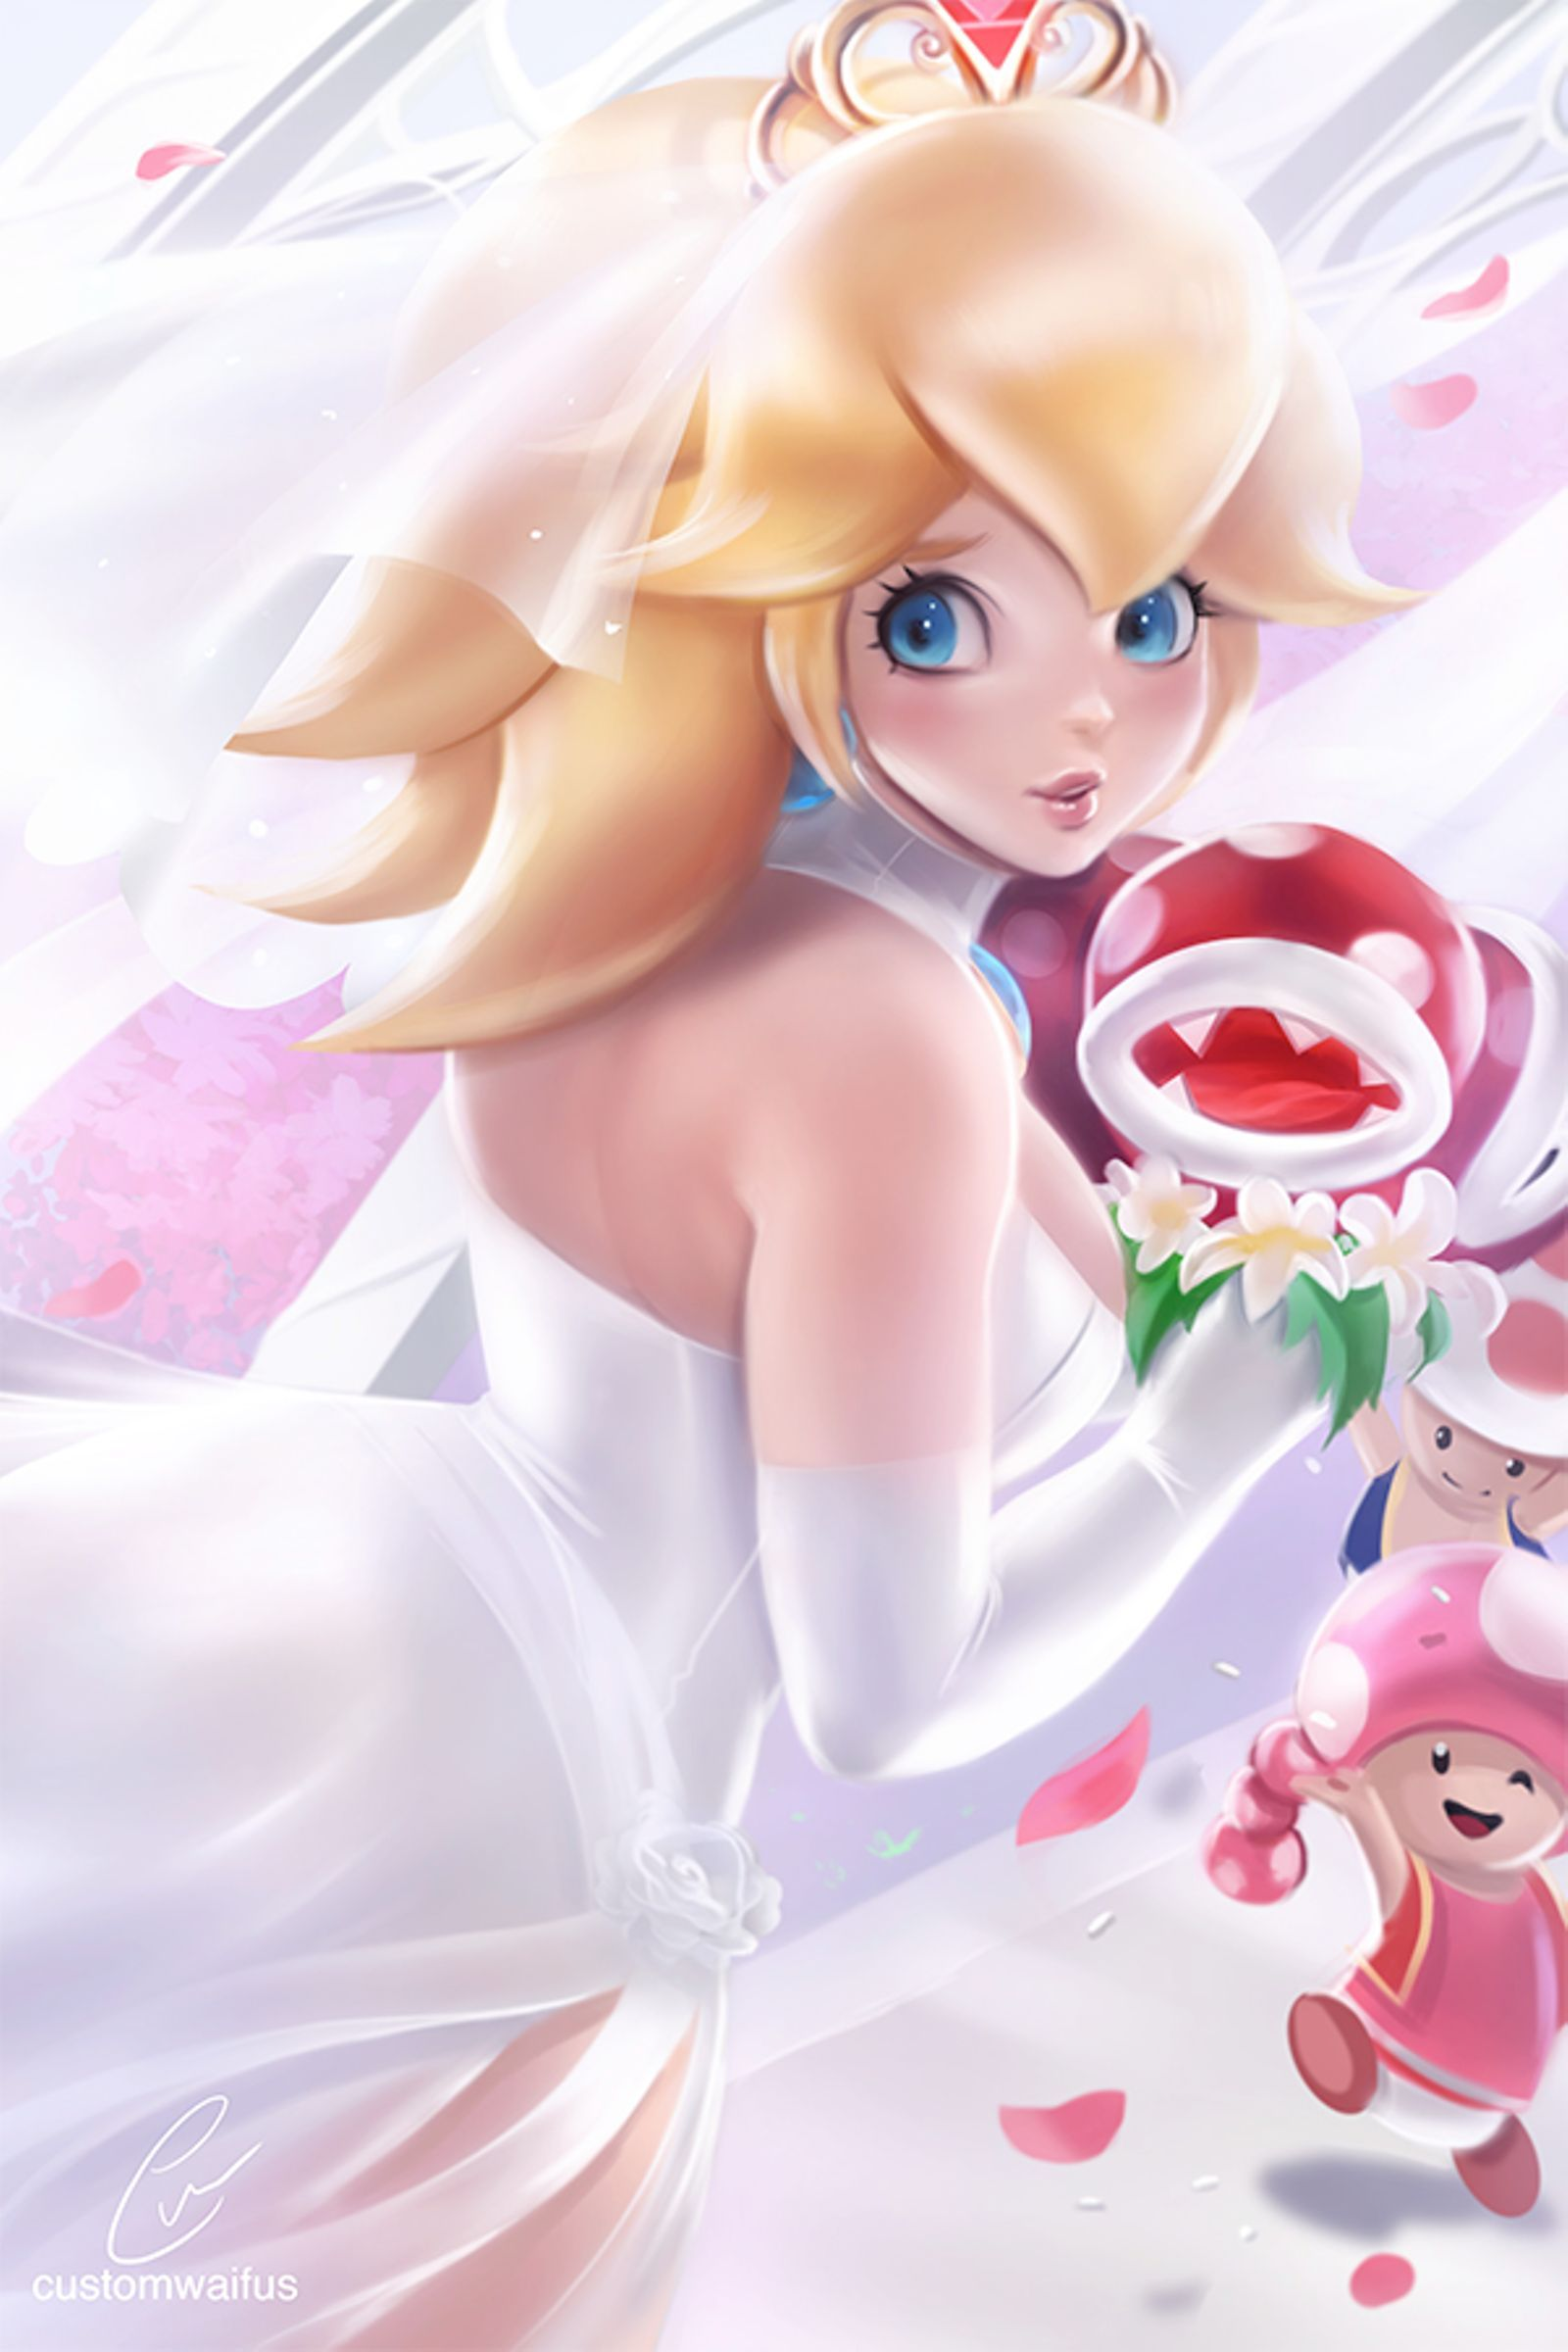 Super Mario | Super Mario | Pinterest | Nintendo, Princess peach and ...